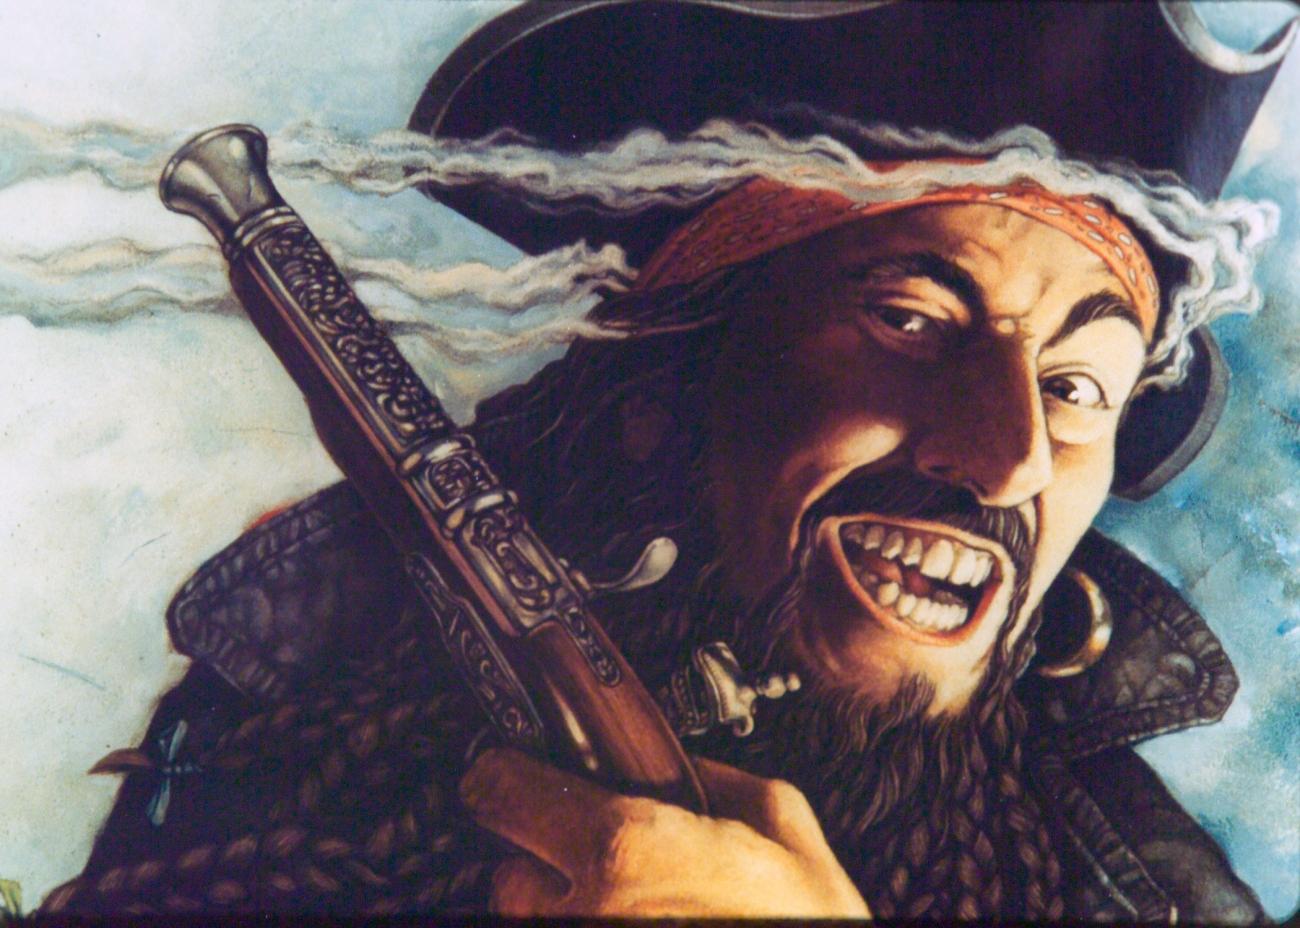 El pirata Blackbeard surgió en Bristol